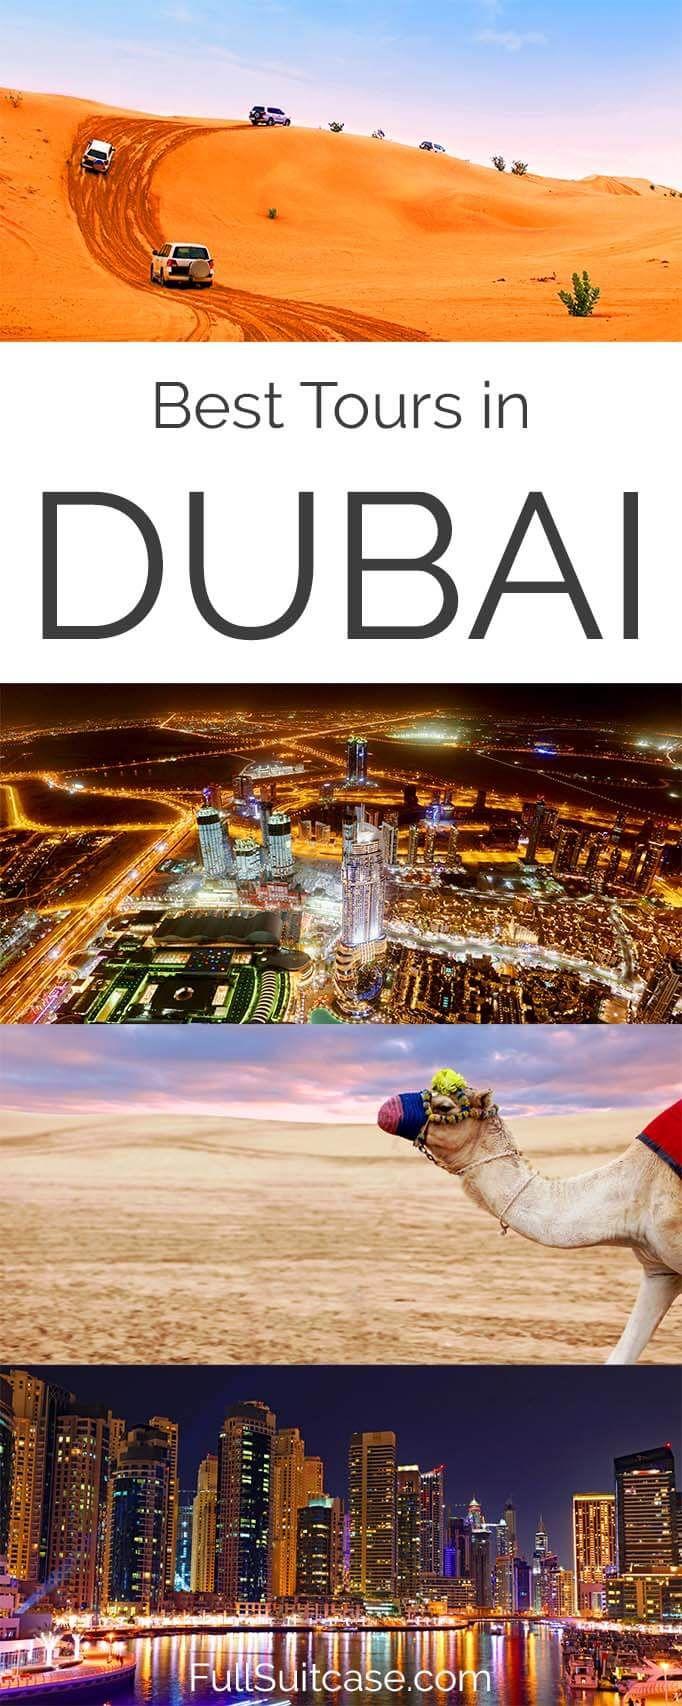 Best excursions, tours, and day trips in Dubai UAE #dubai #dubaitravel